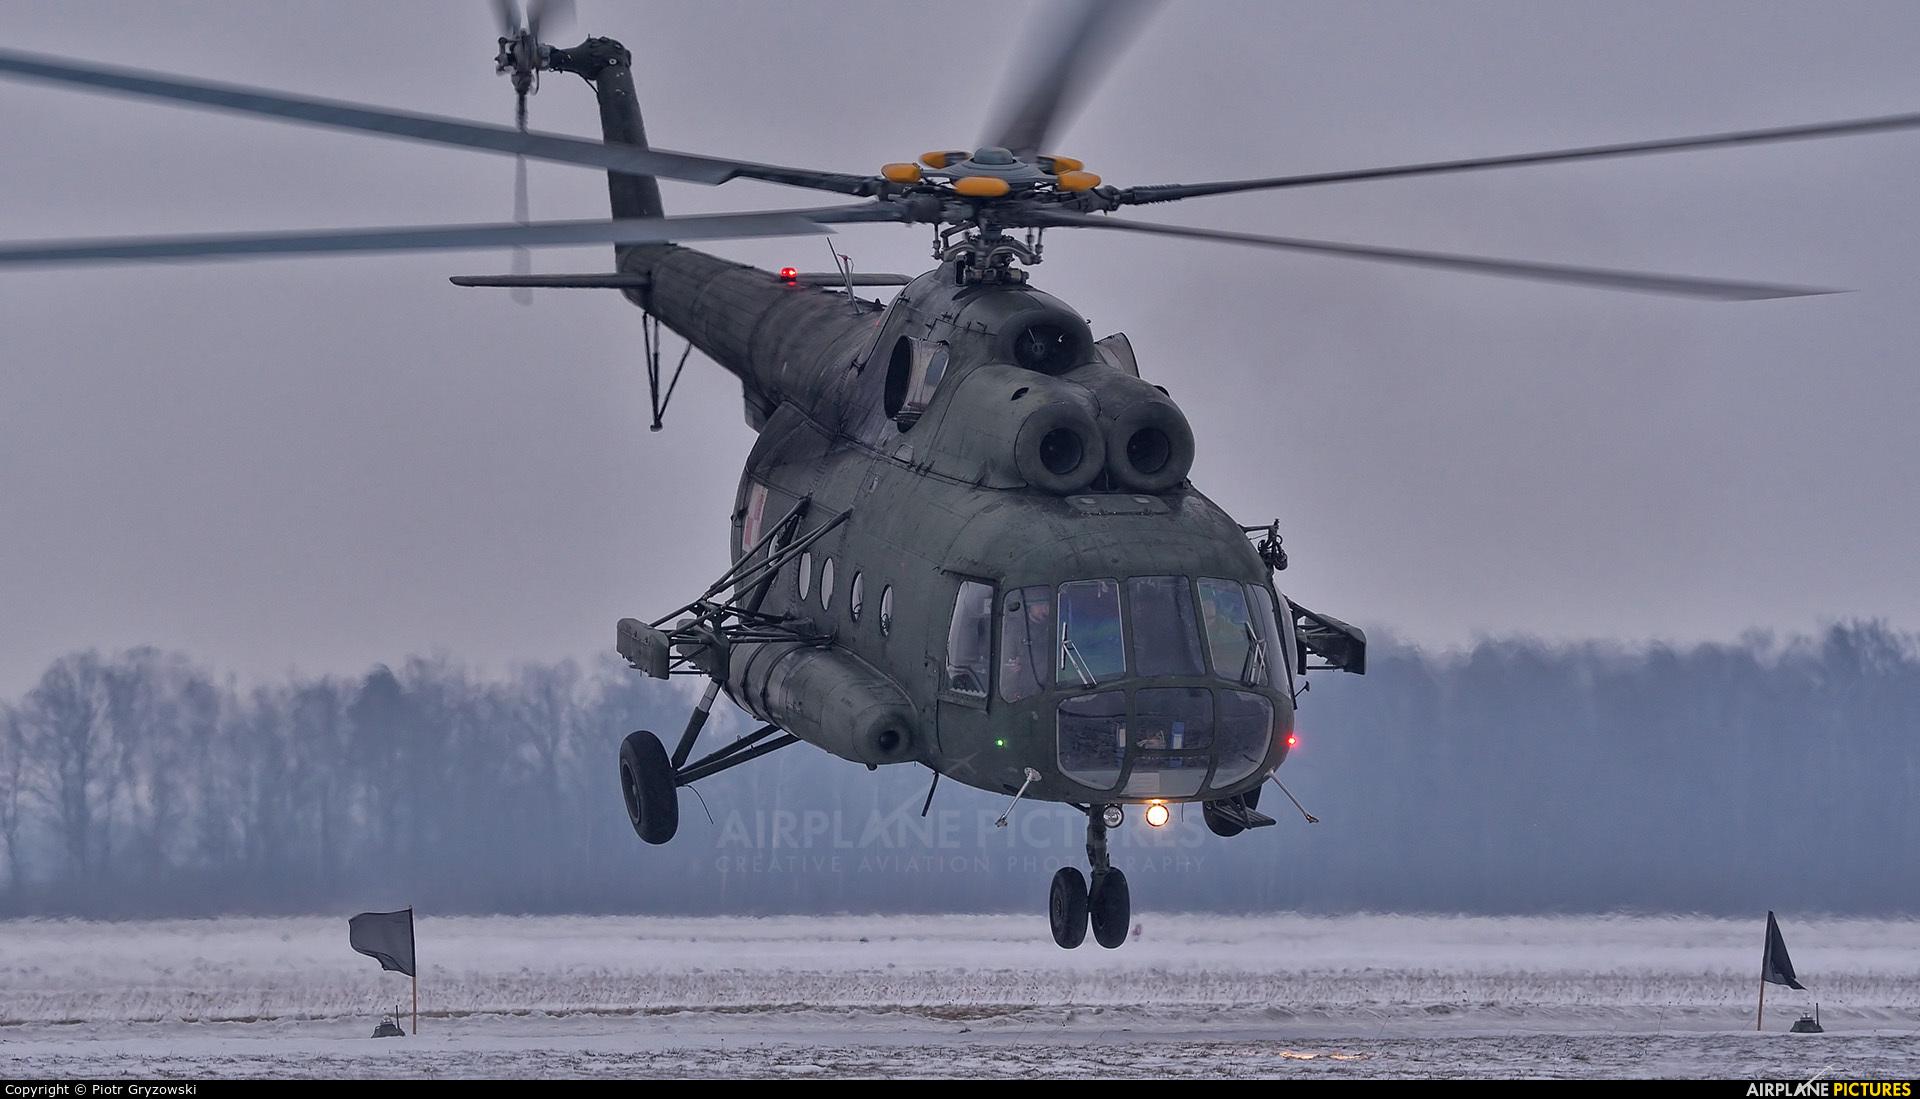 Poland - Army 642 aircraft at Leźnica Wielka